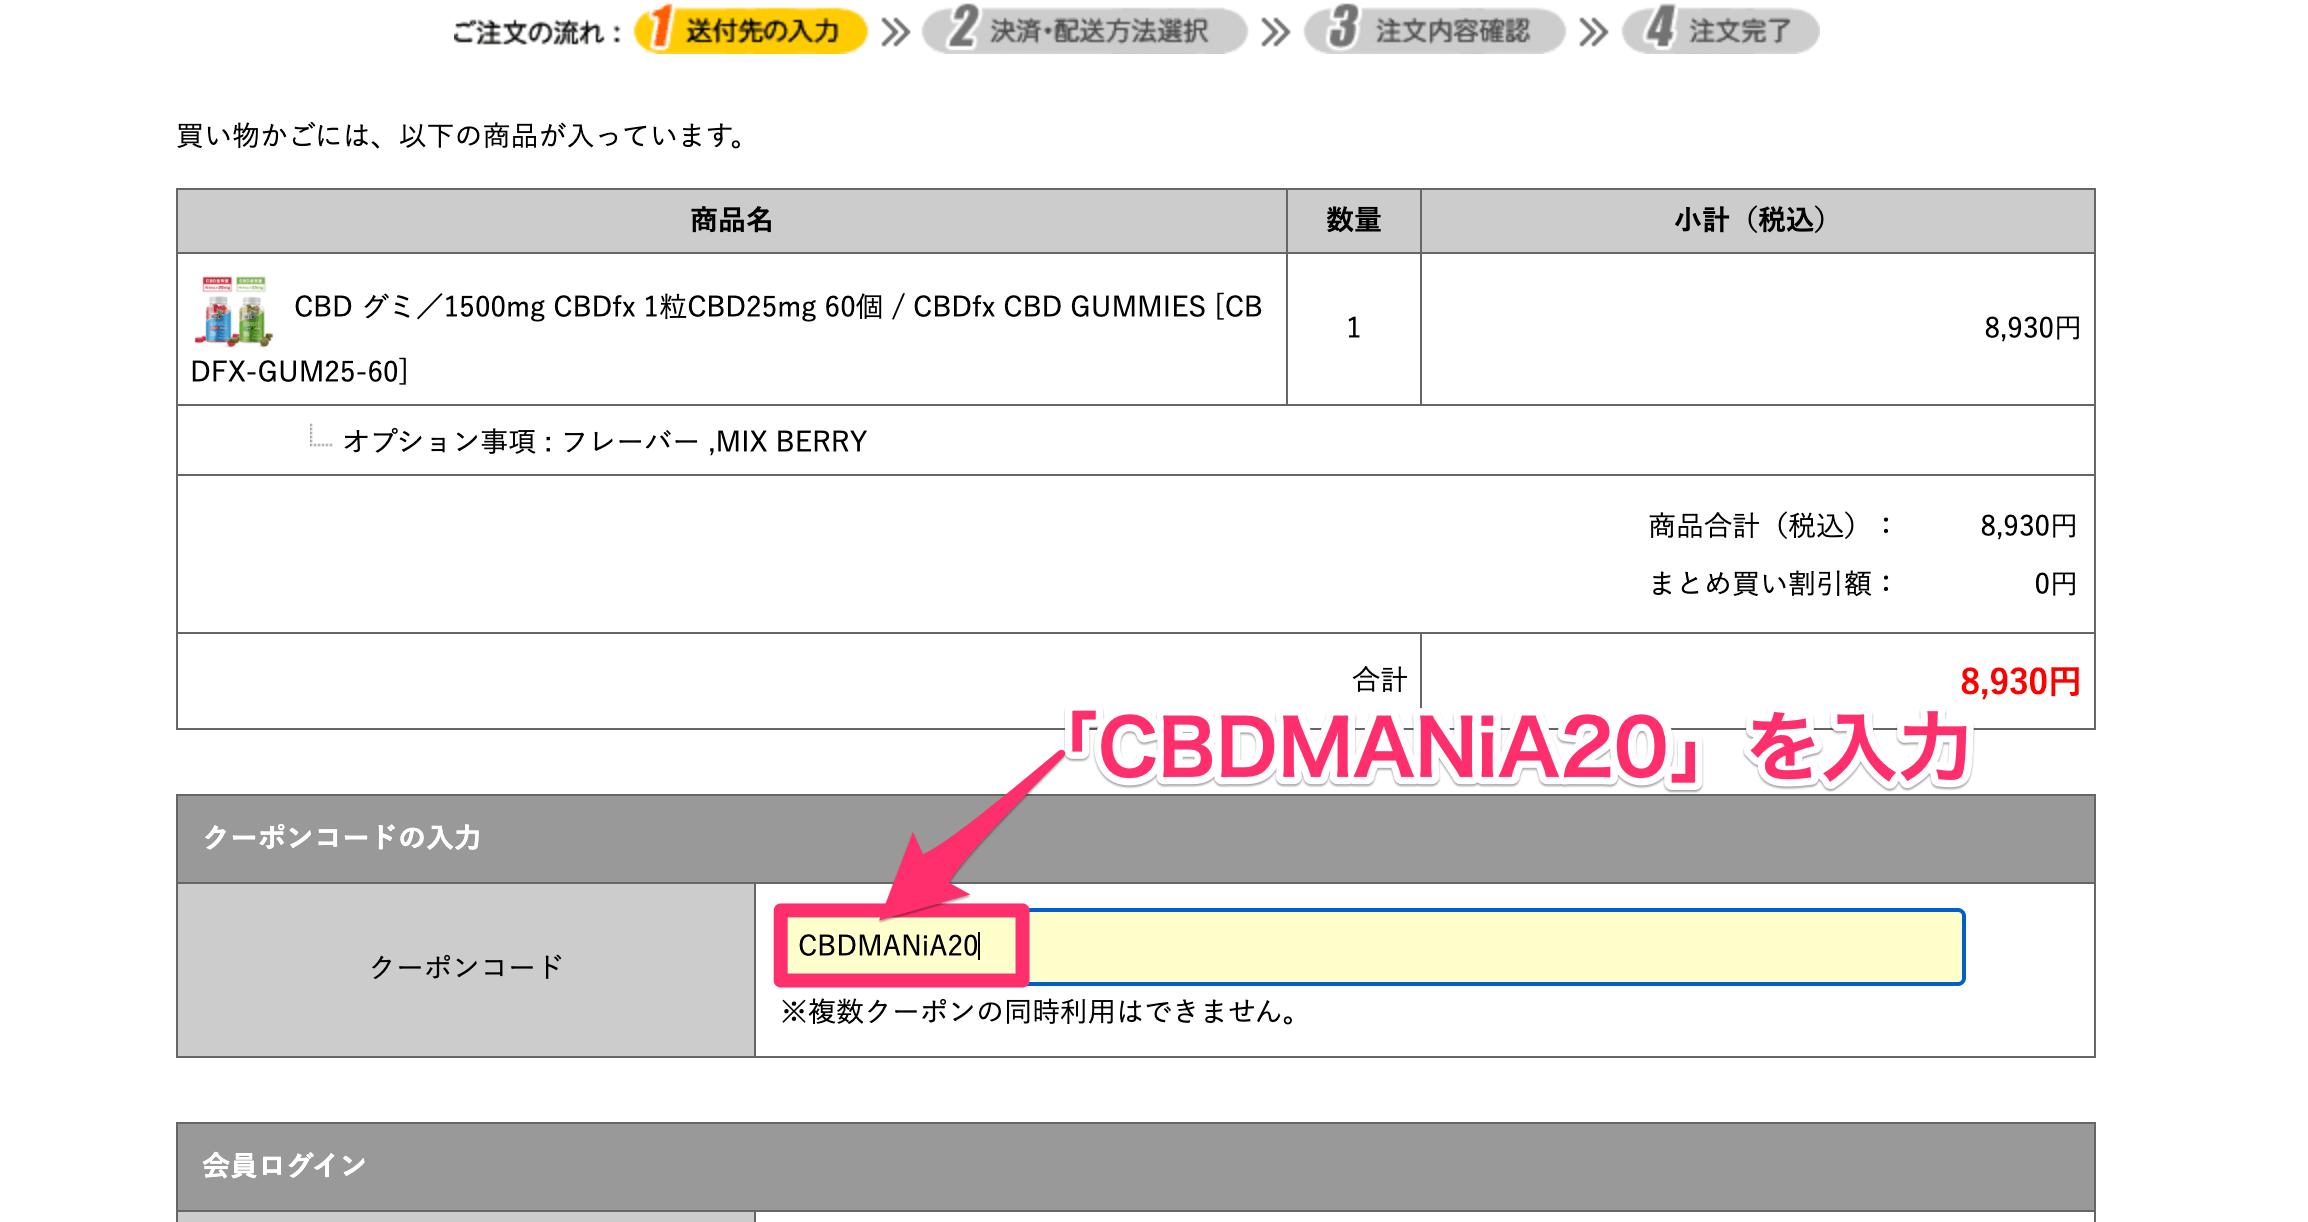 CBDfxの購入方法:クーポンコードの入力